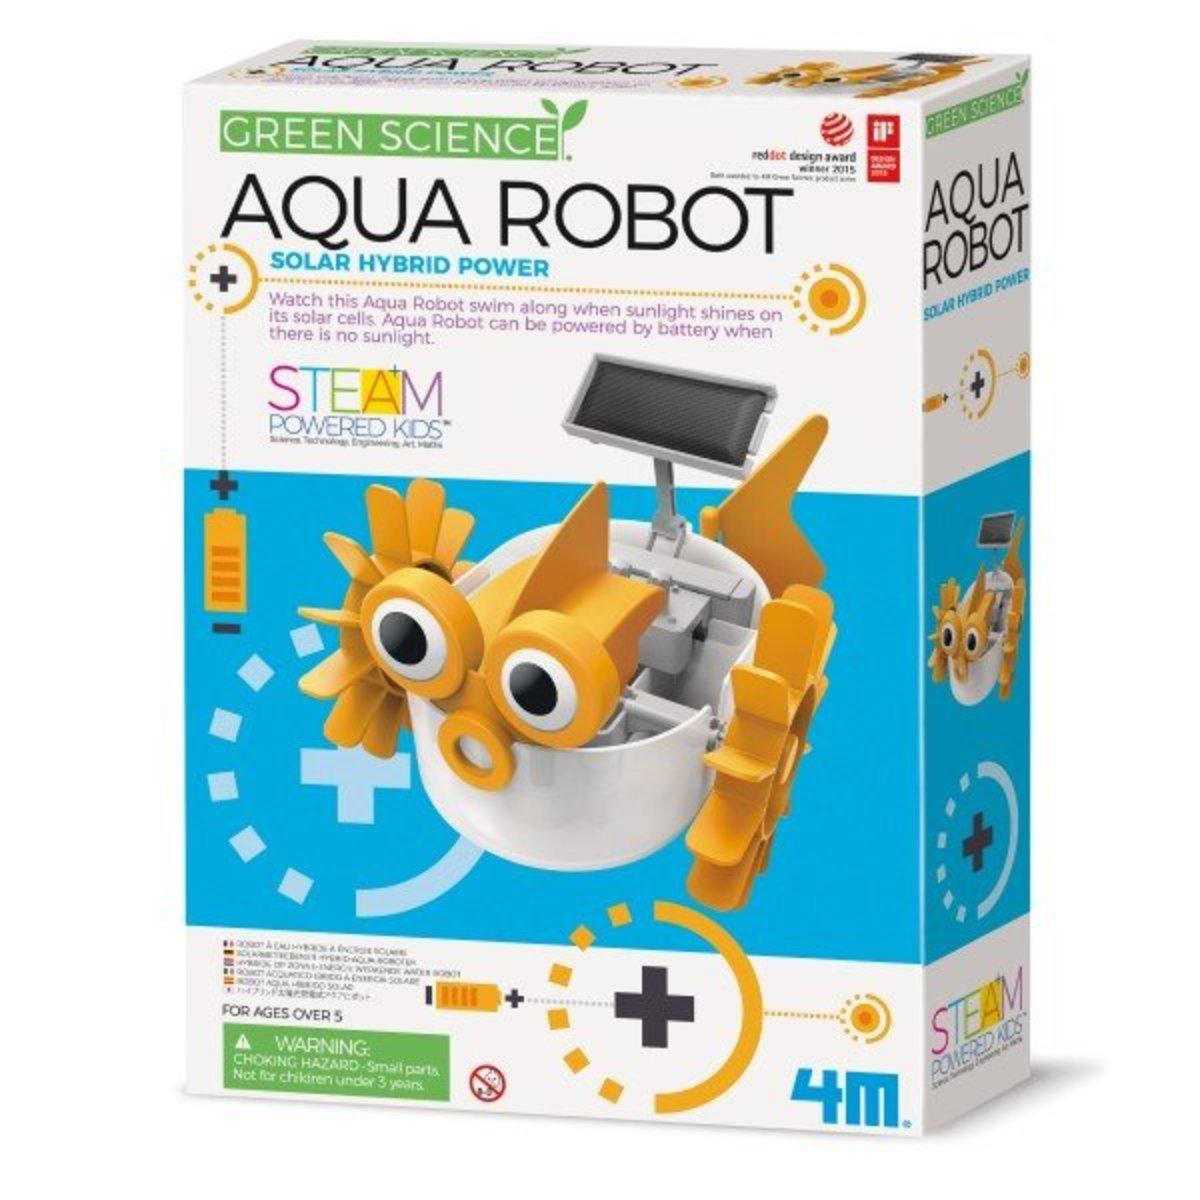 Green Science Hybrid Solar Power - Aqua Robot